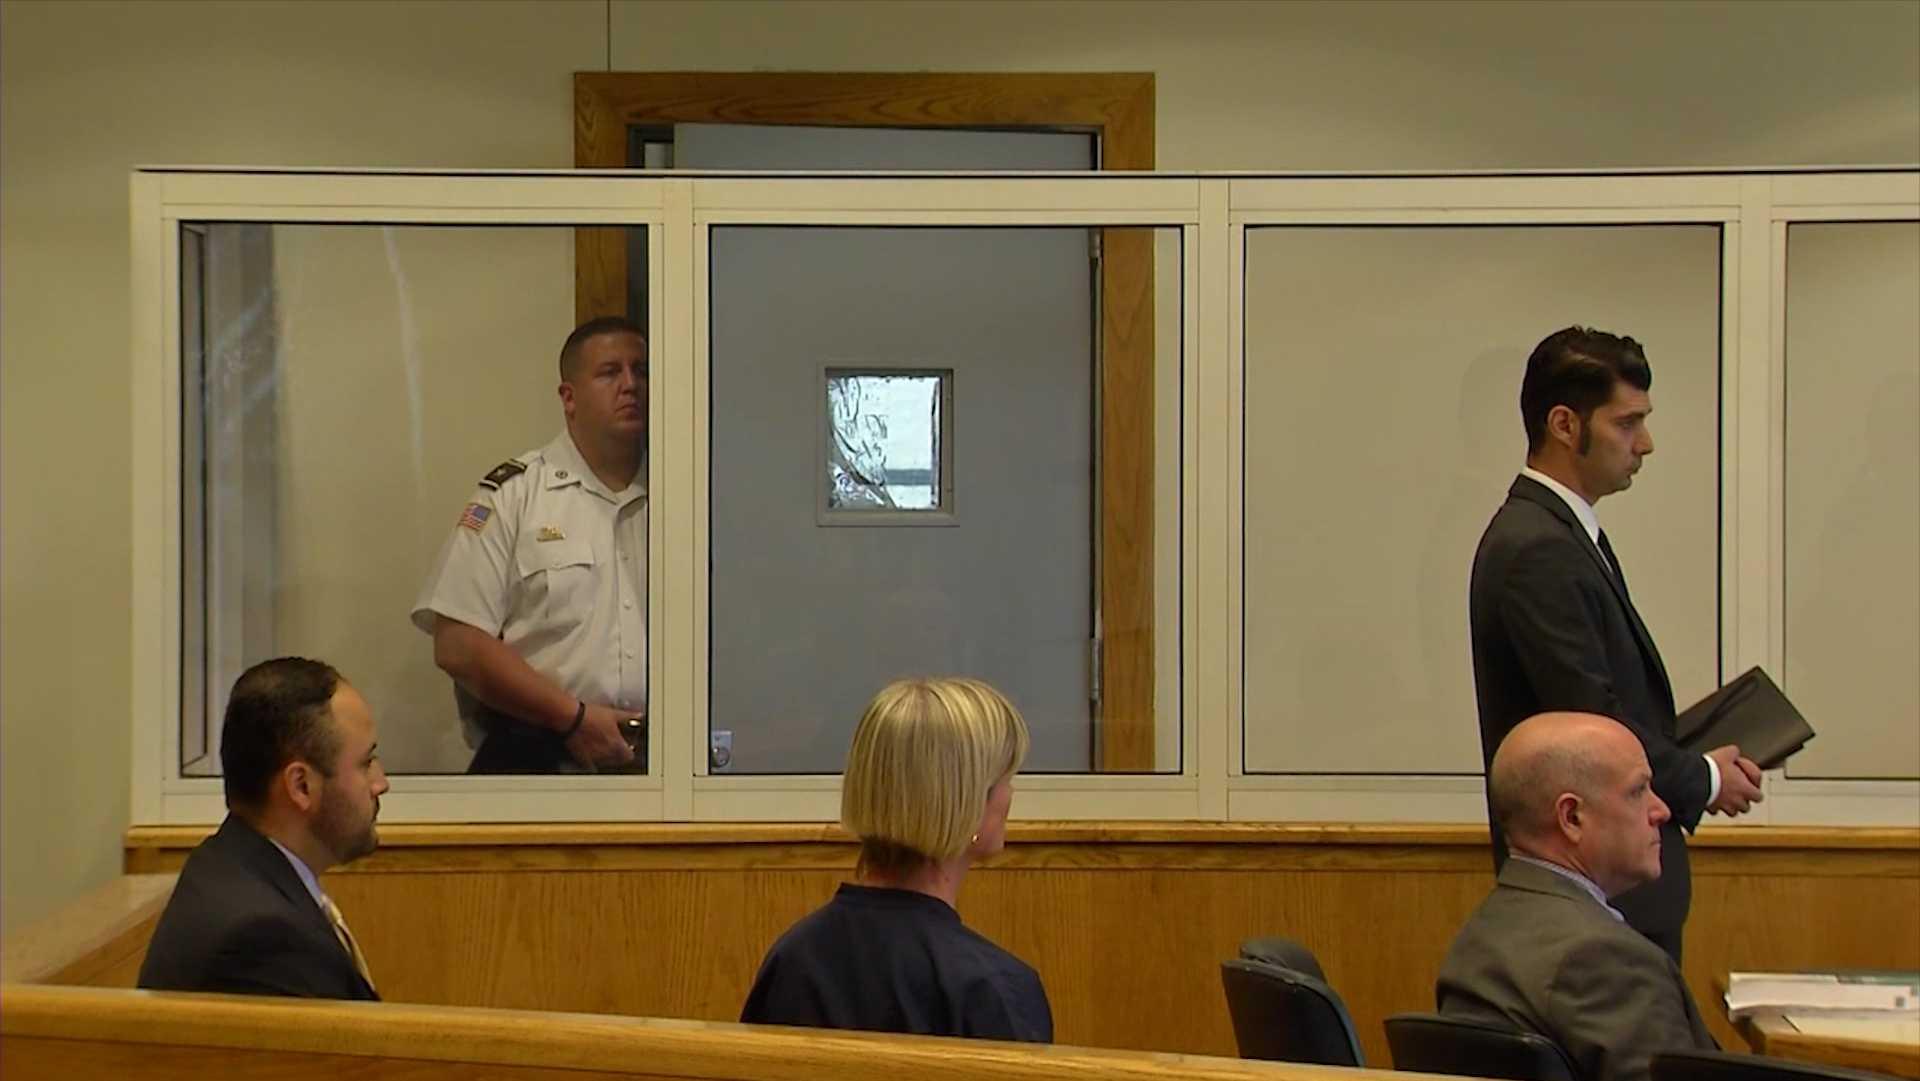 Stabbing suspect McKinley Archie concealed behind door in court